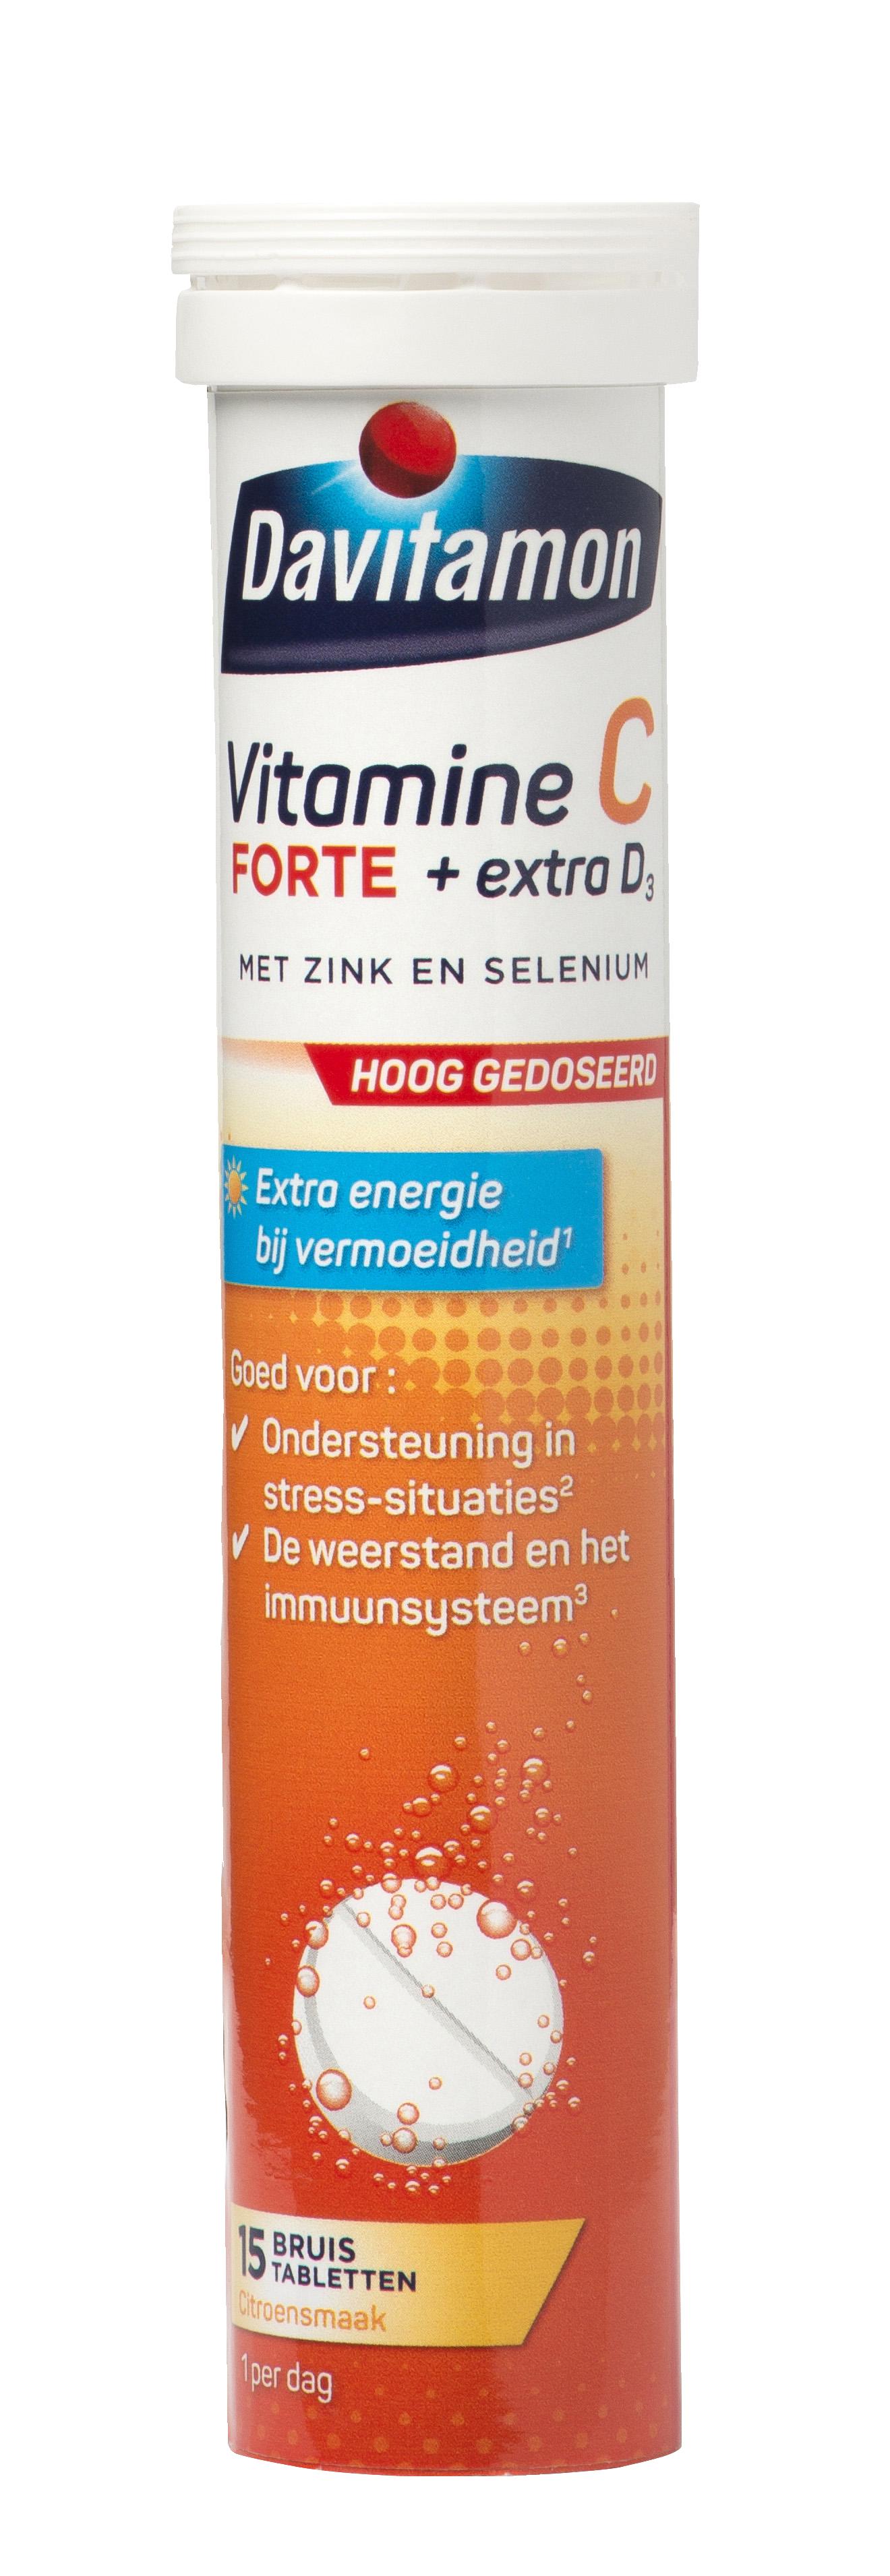 Davitamon Vitamine C Forte + extra D<sub>3</sub> &#8211; 15 bruistabletten